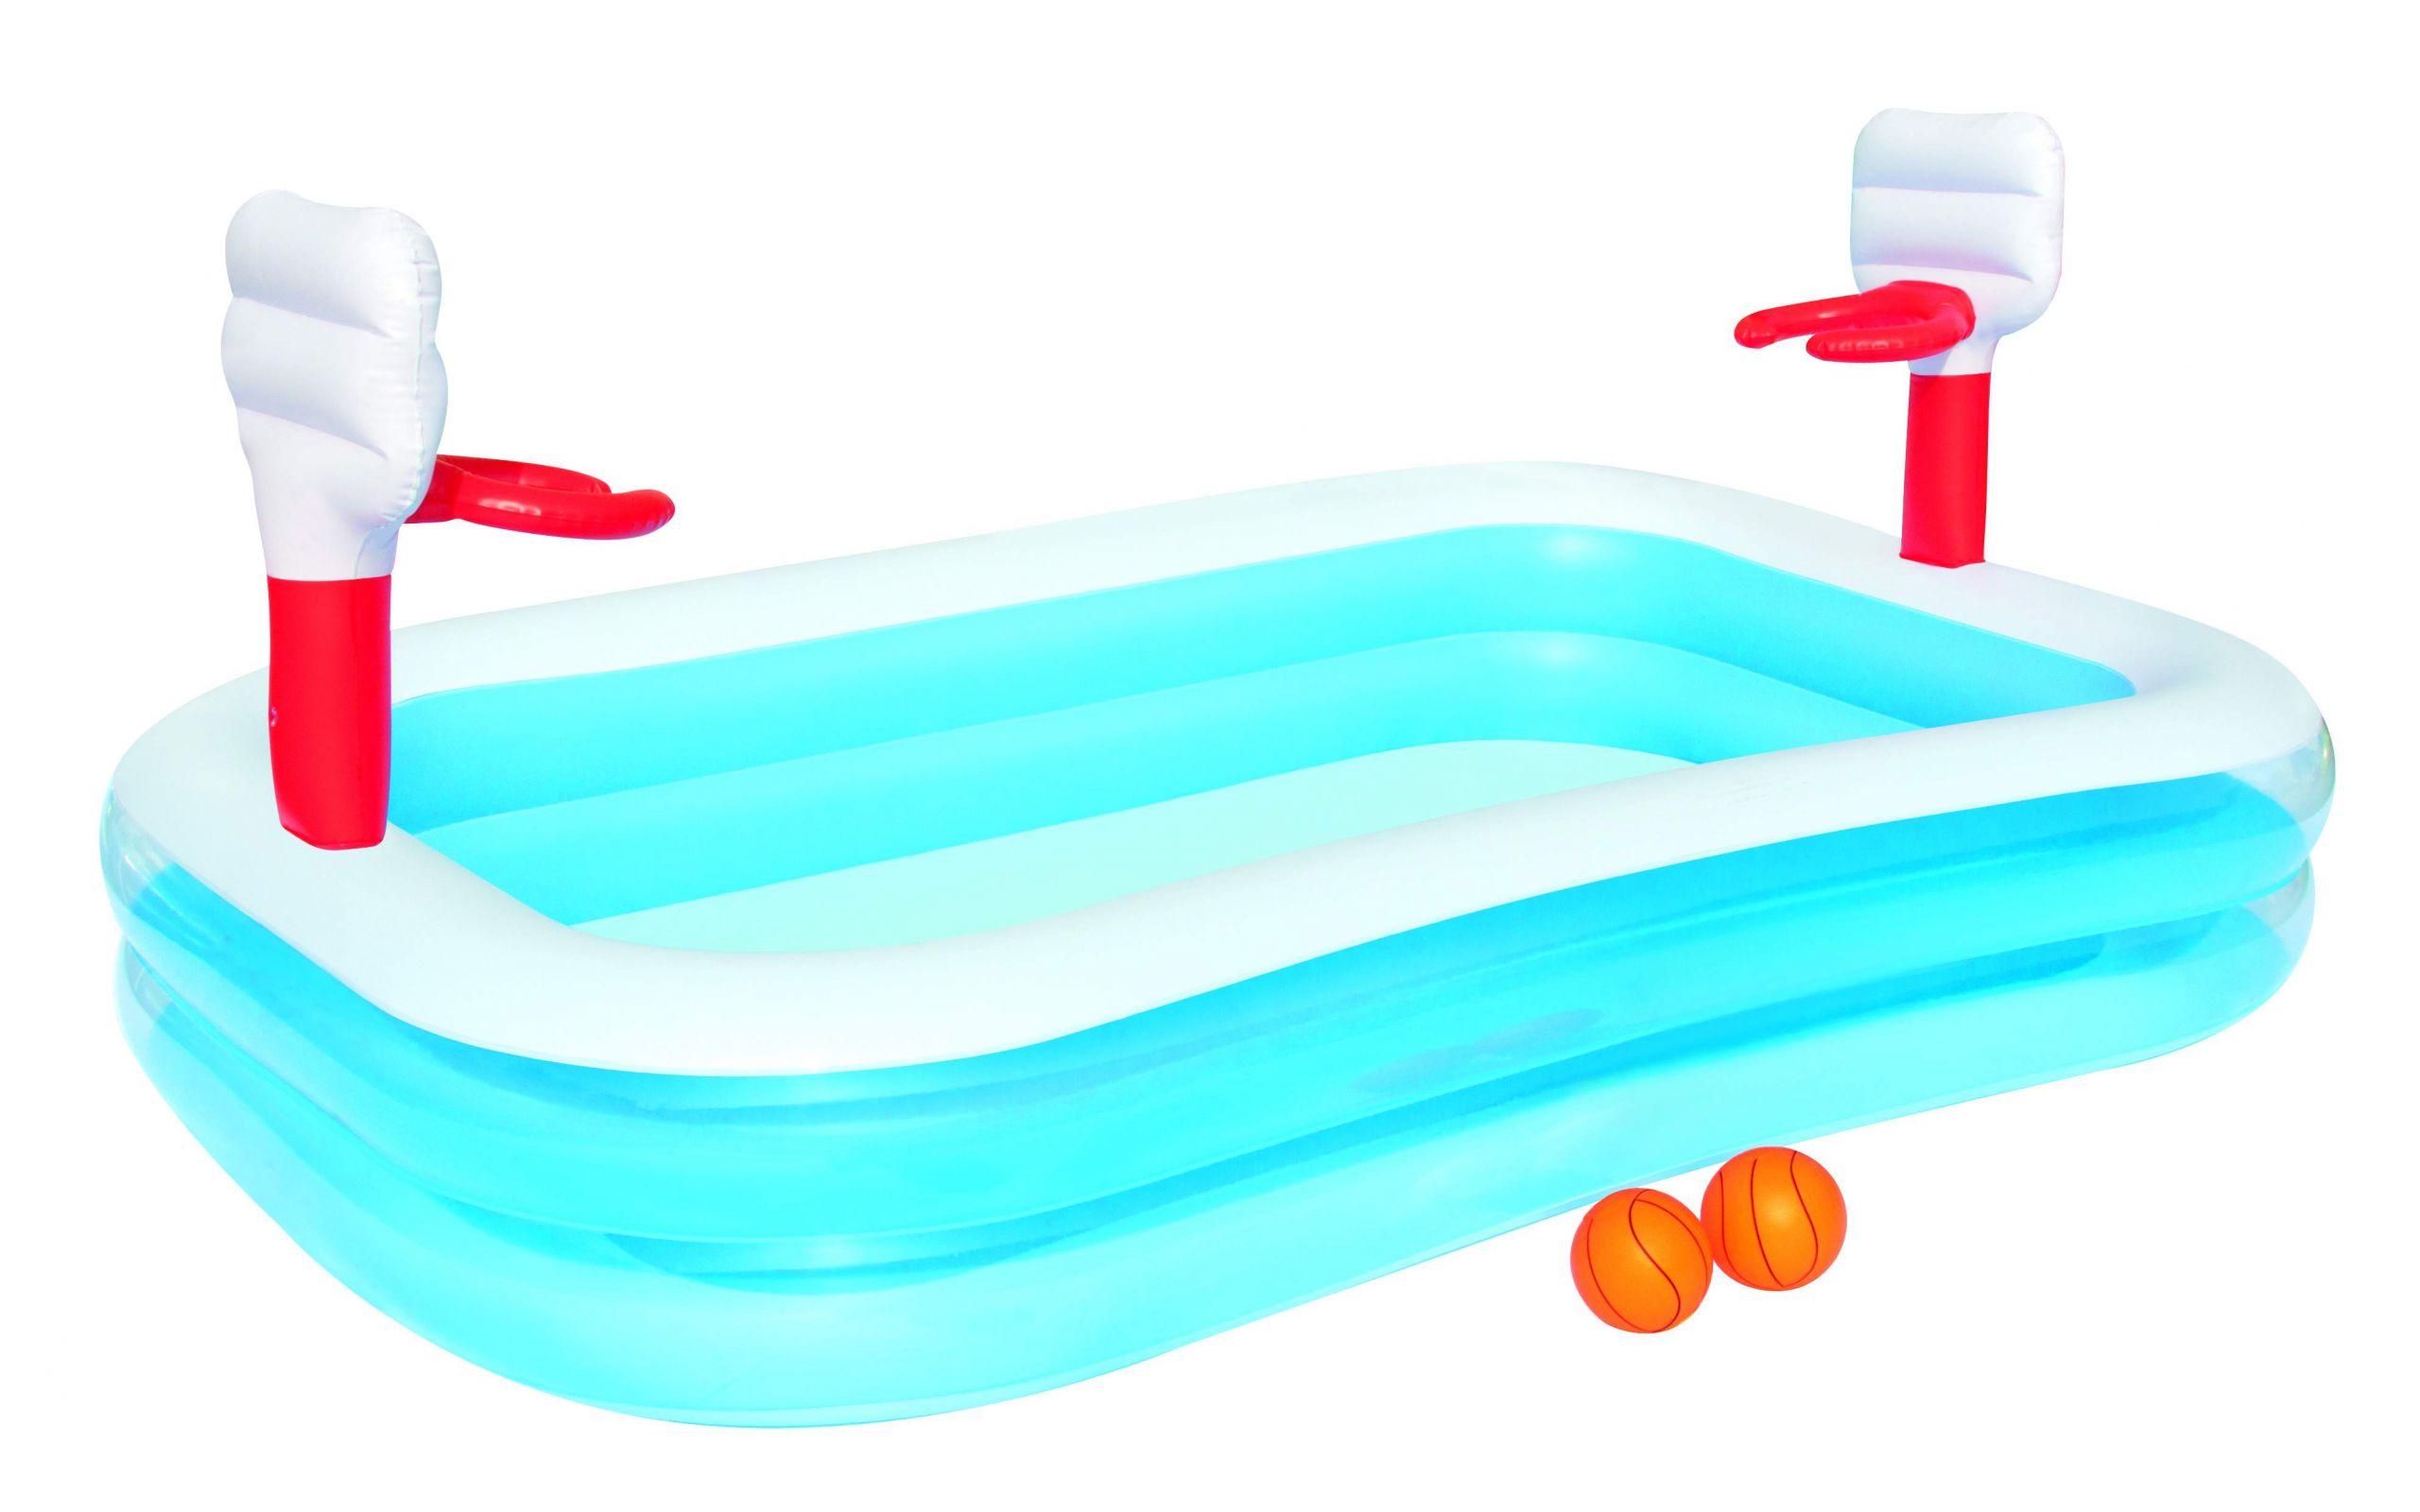 "Garten Pool Aufblasbar Neu Pool ""sports"" 251x168x102cm Blau Weiß Rot Aufblasbar Basketball Sportpool Spielpool"